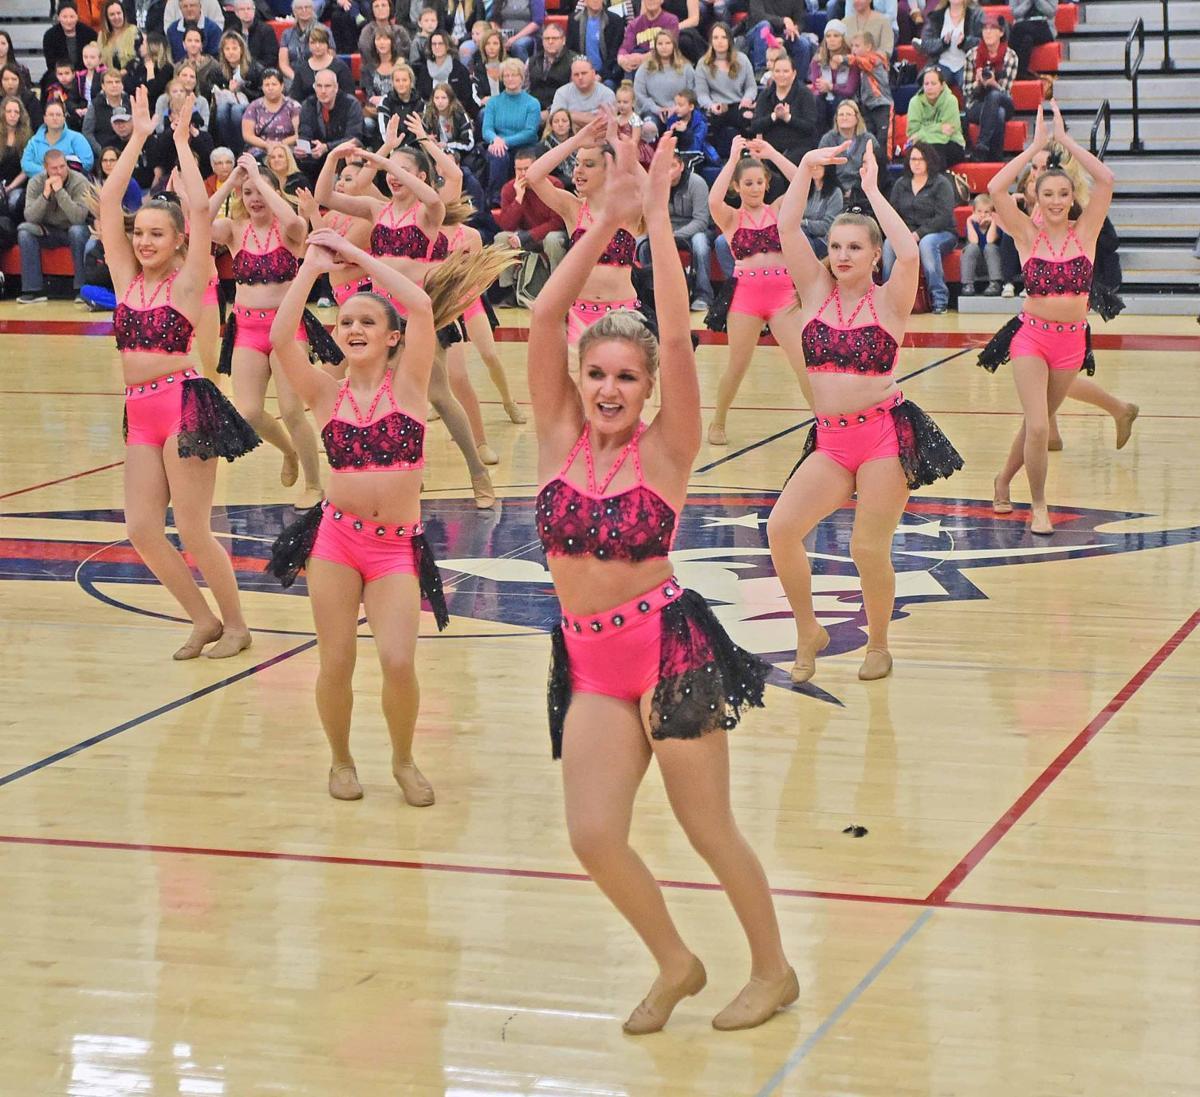 Showcase 2017 Features Area Dance Teams Tribune Photo Collections